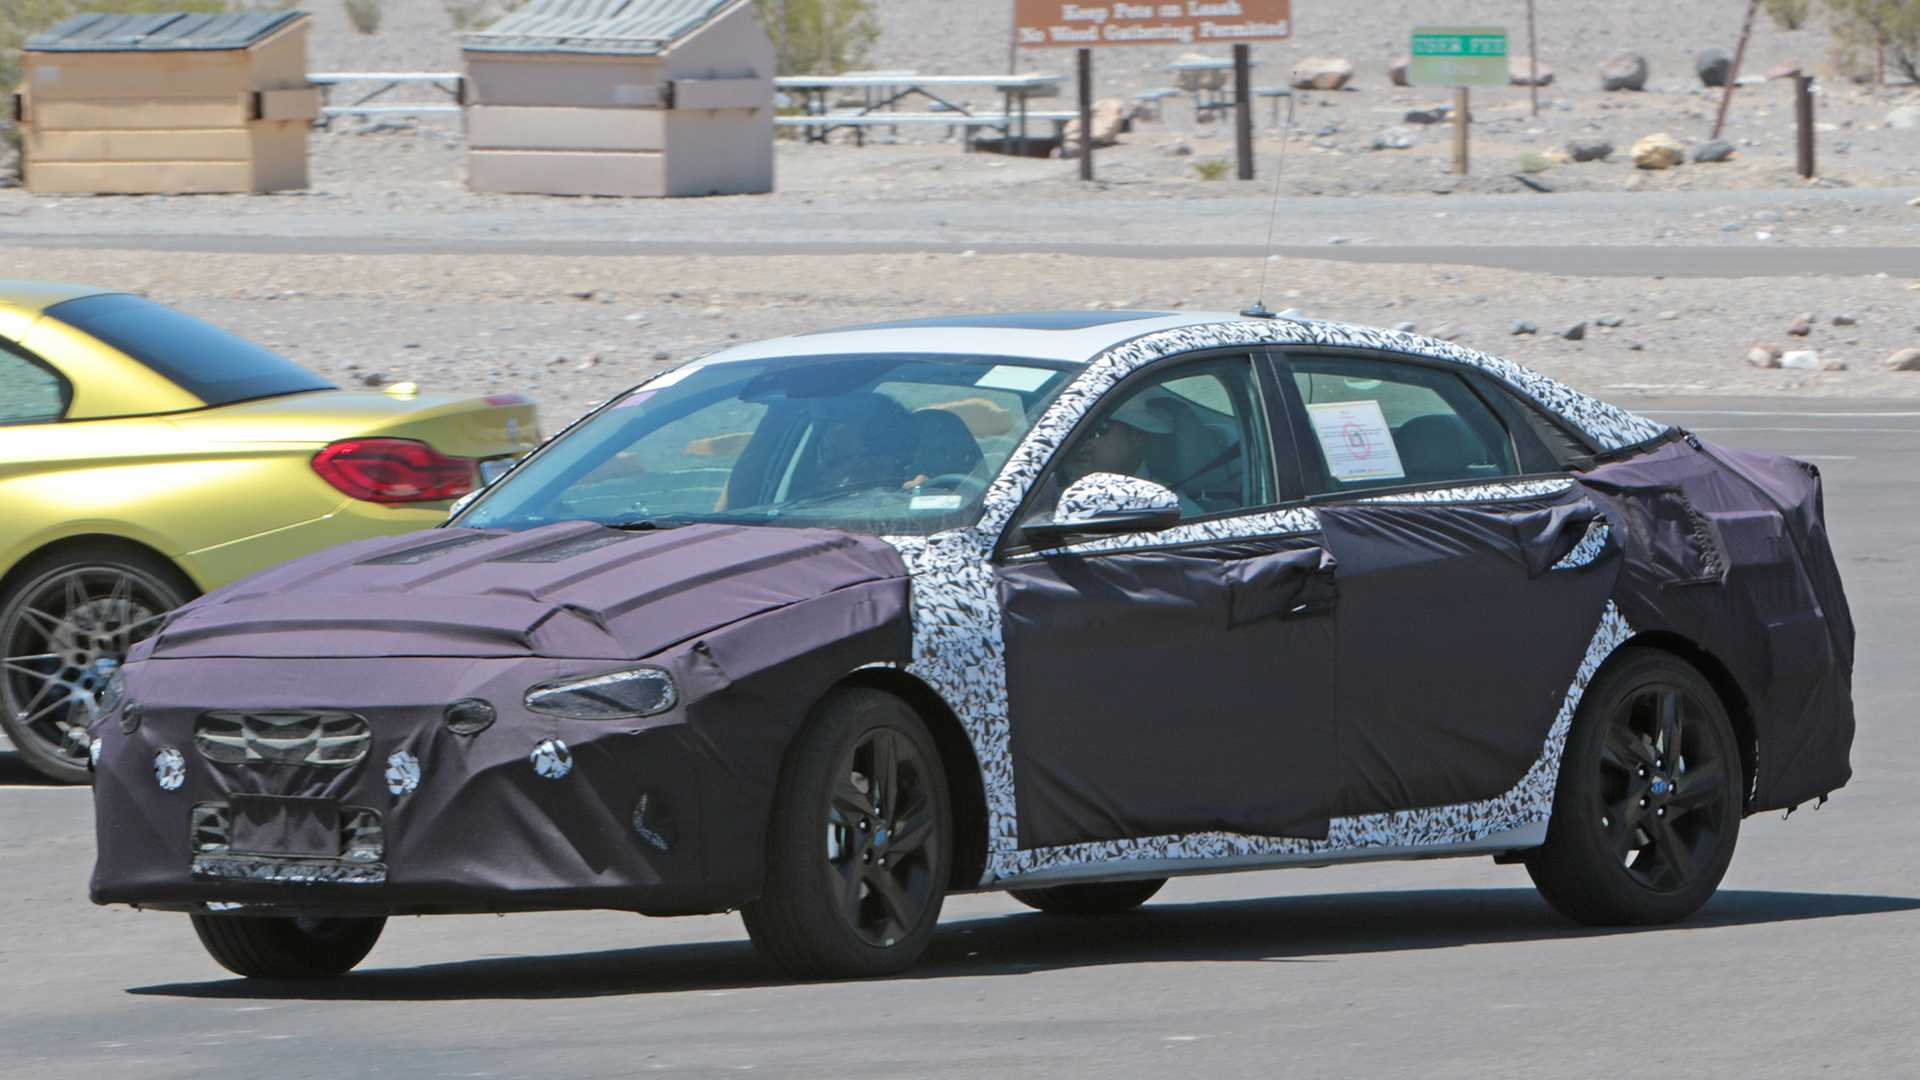 Next-Gen Hyundai Elantra Spied For the First Time 6